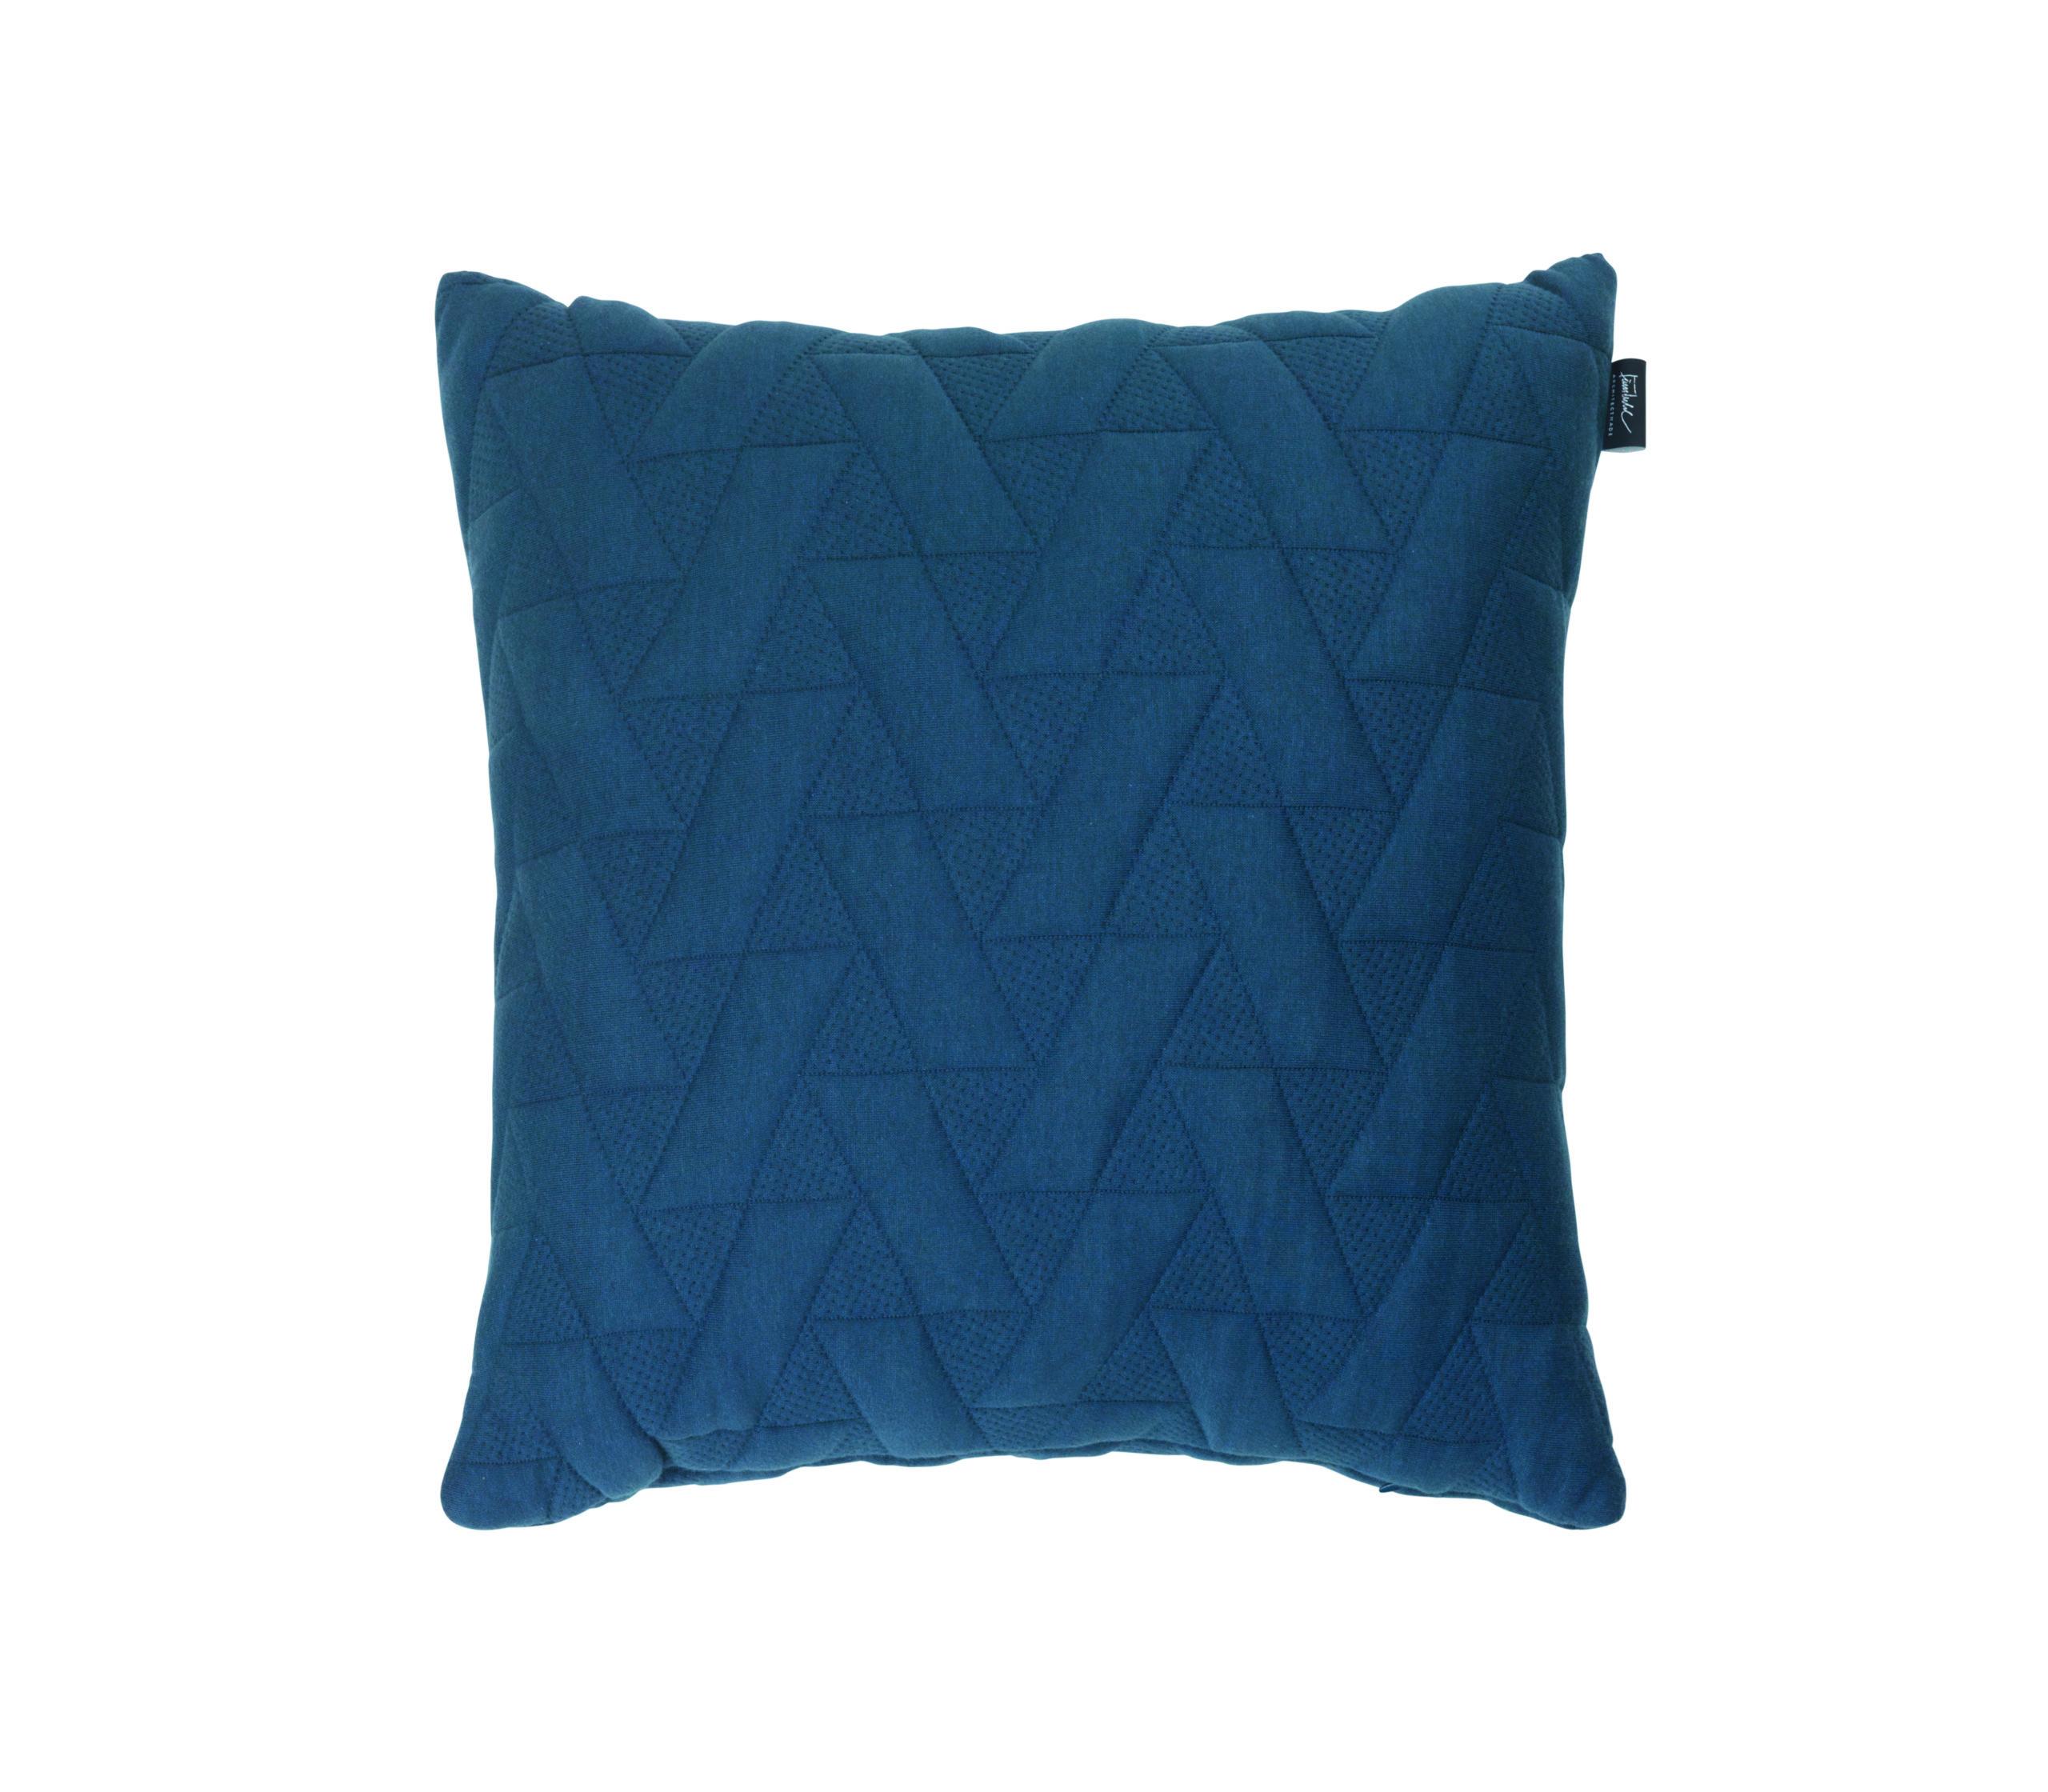 Architectmade-FJ-Pattern-50x50-Pillow-Blue-Organic-Cotton-Finn-Juhl